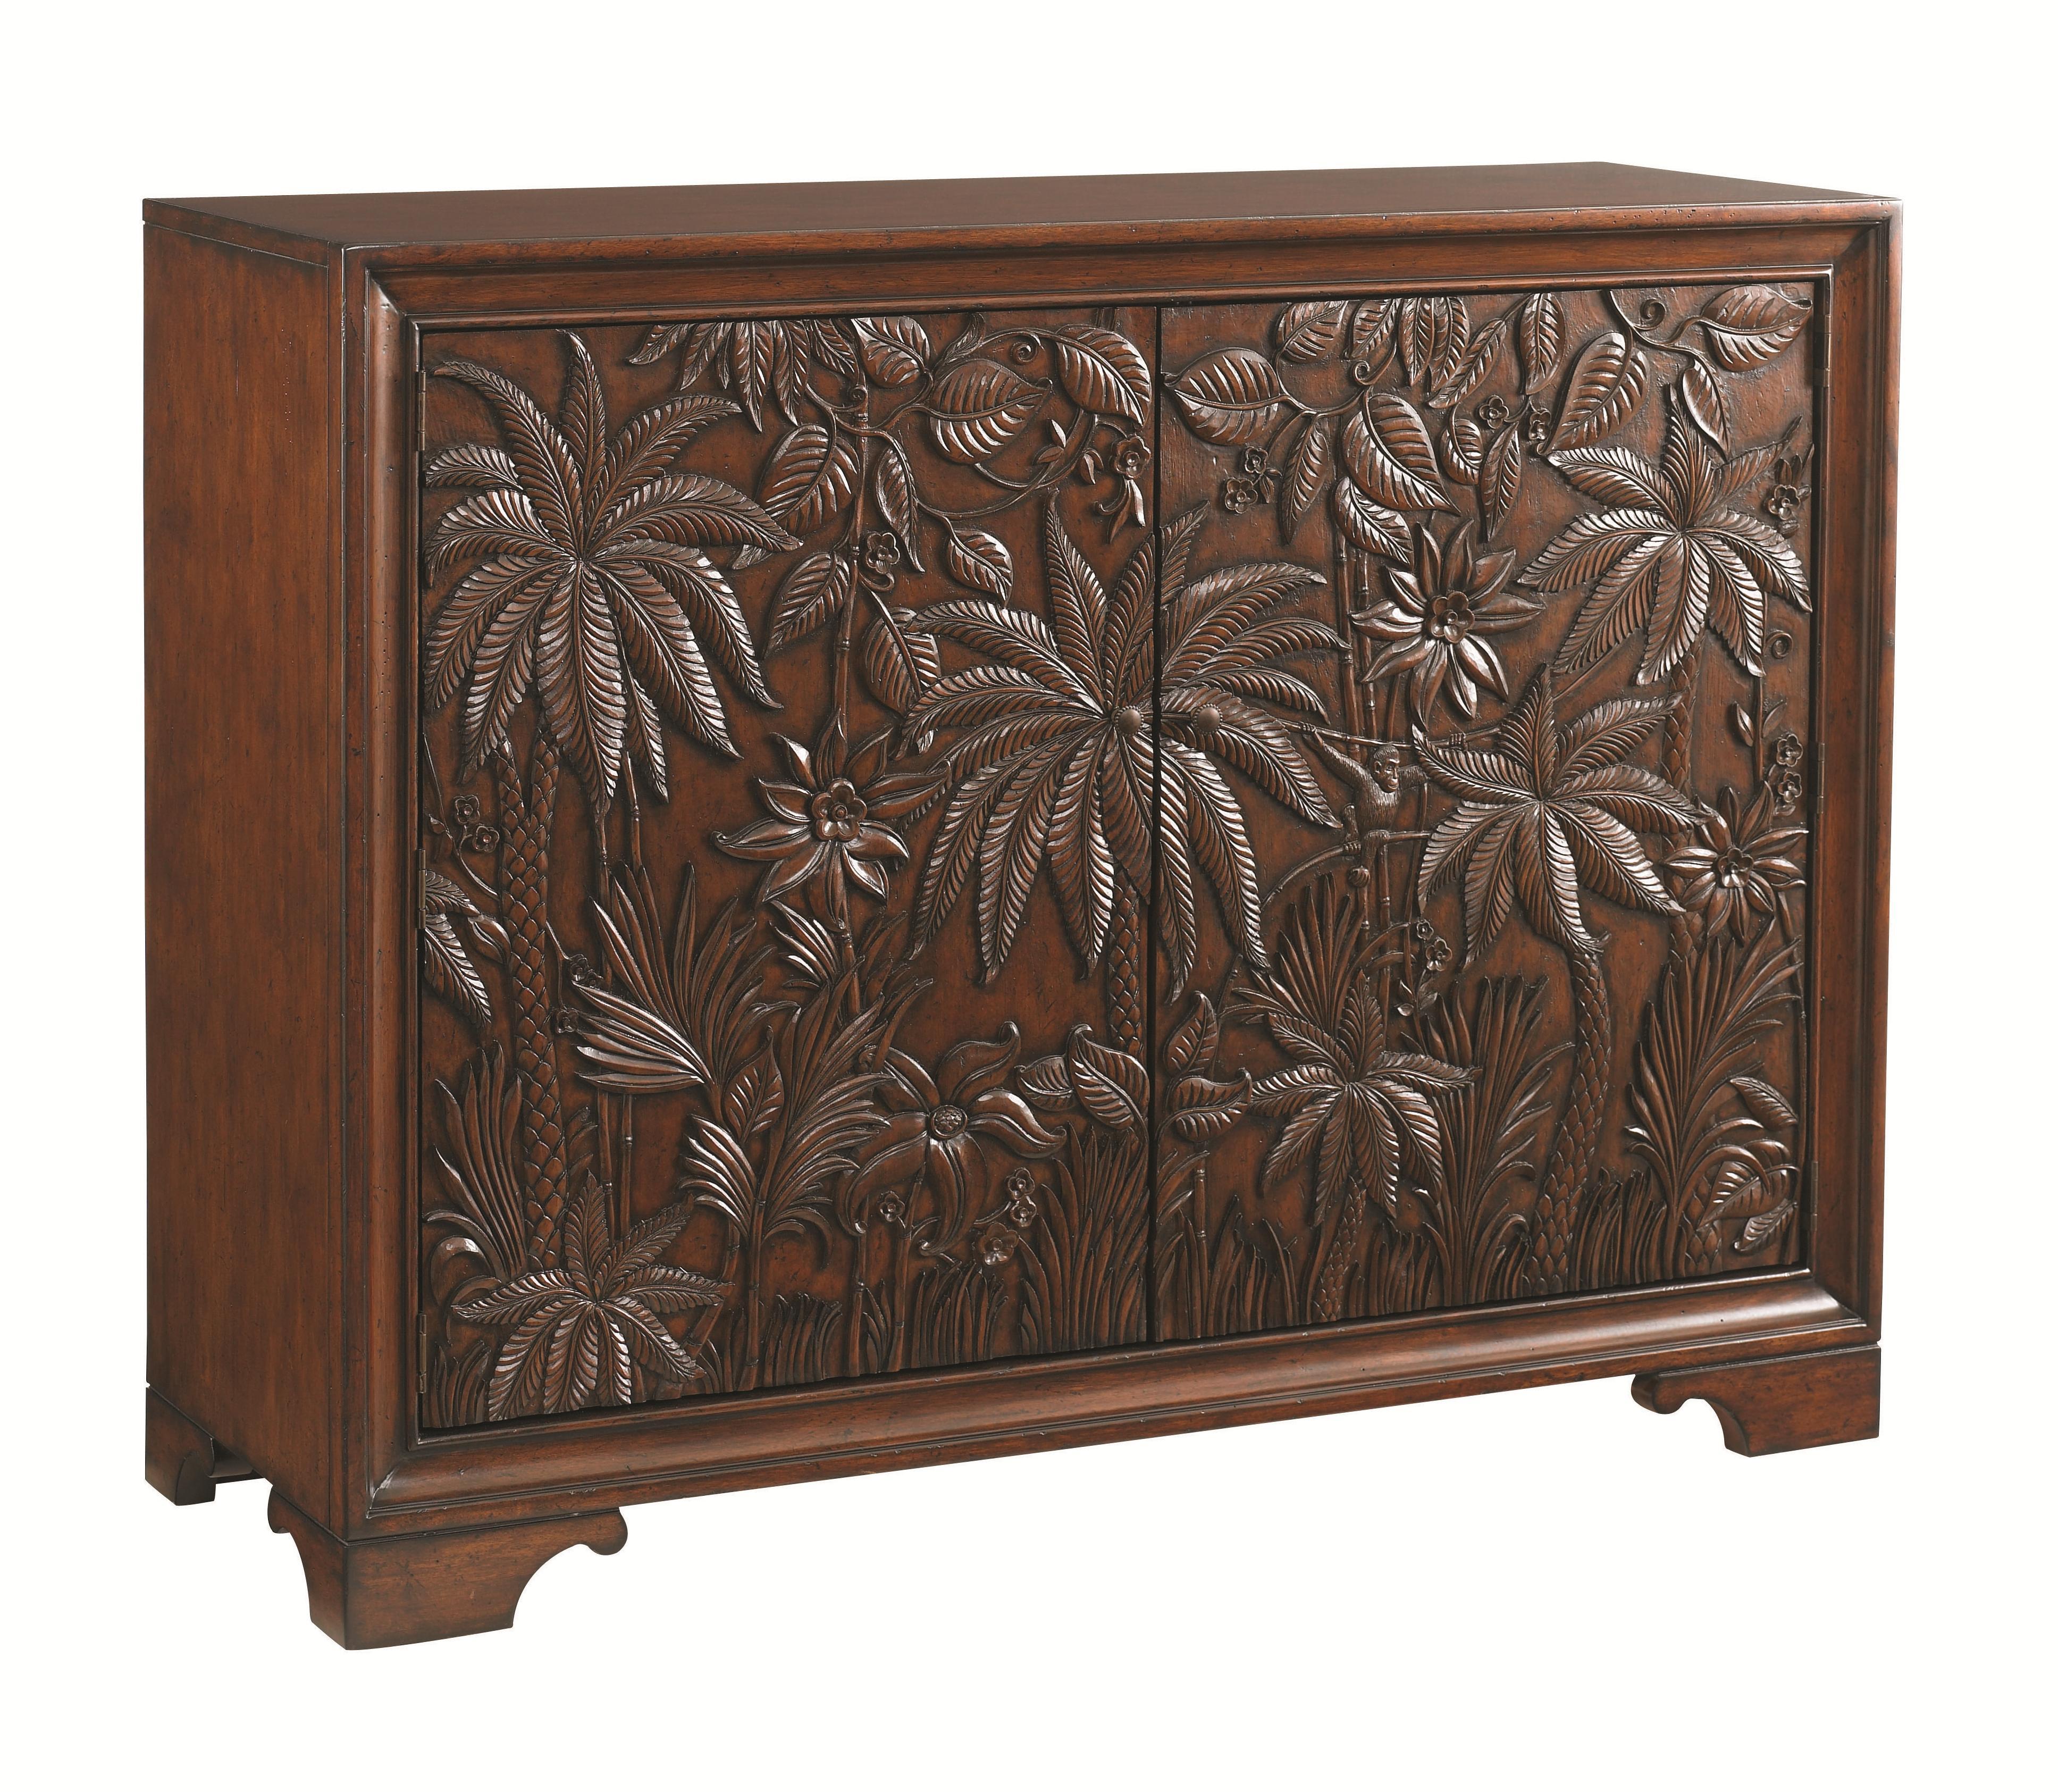 Tommy Bahama Home Landara Balboa Carved Door Chest - Item Number: 545-973